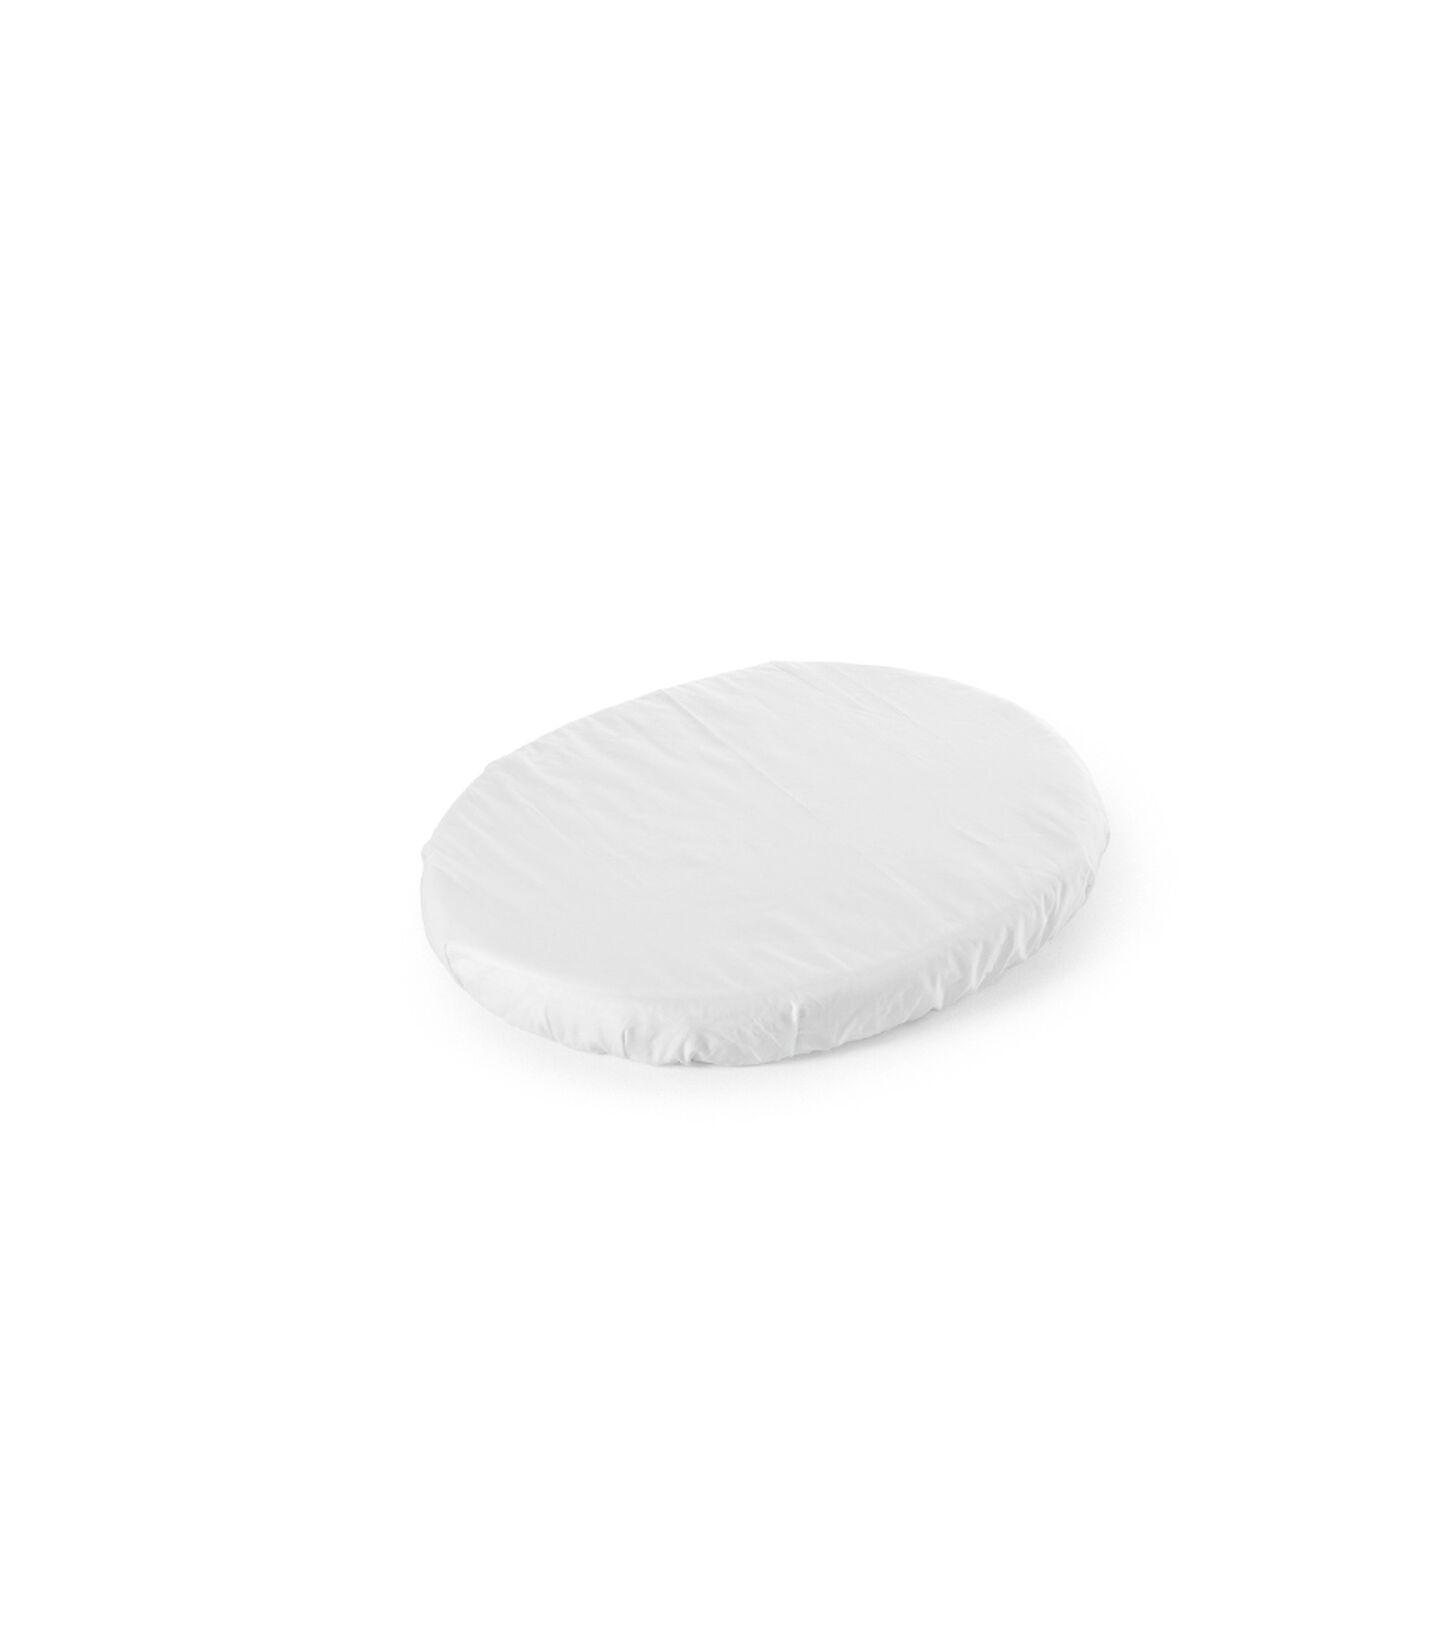 Stokke® Sleepi™ Mini Fitted Sheet Blanc, Blanc, mainview view 1